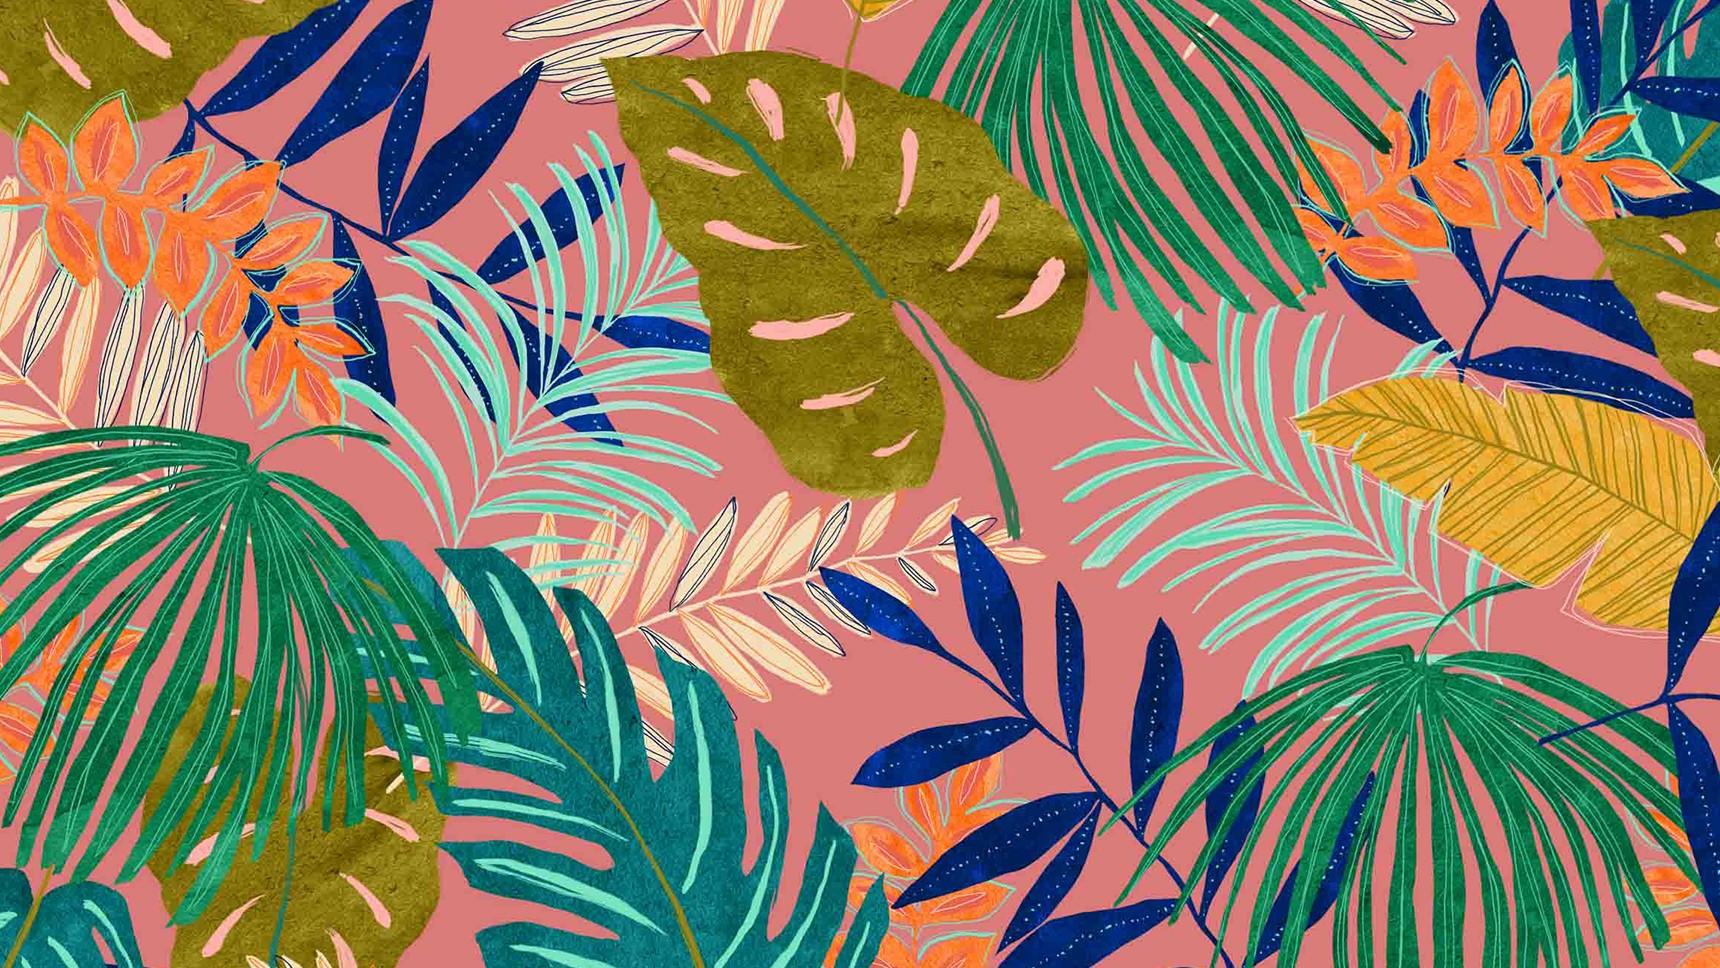 Lona/ Canvas - Caribbean Leaves